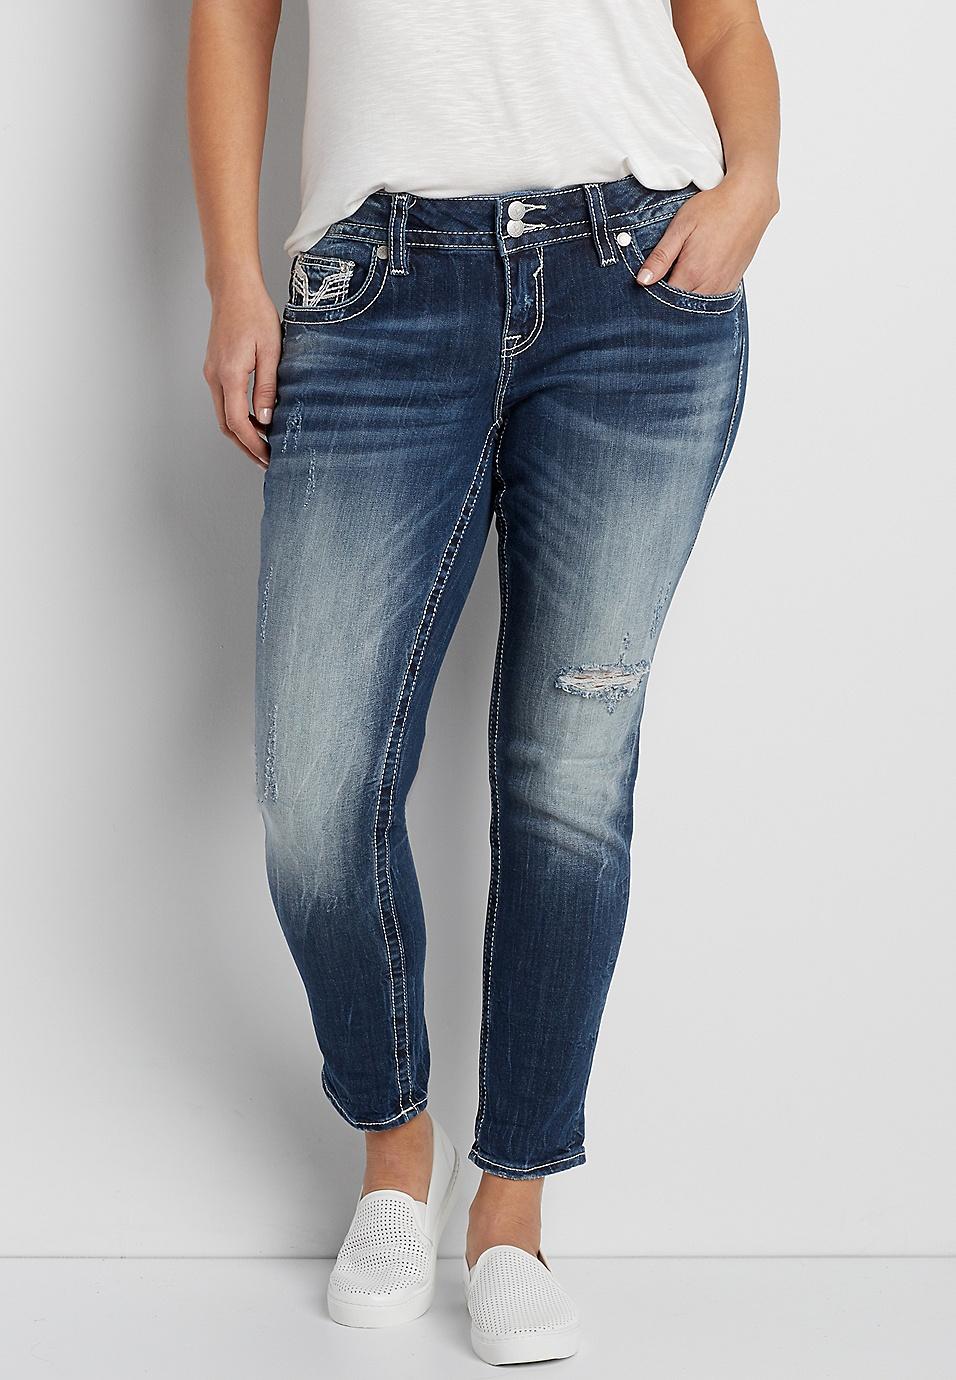 cabd30dbcaf Vigoss® plus size dark wash skinny jeans with destruction